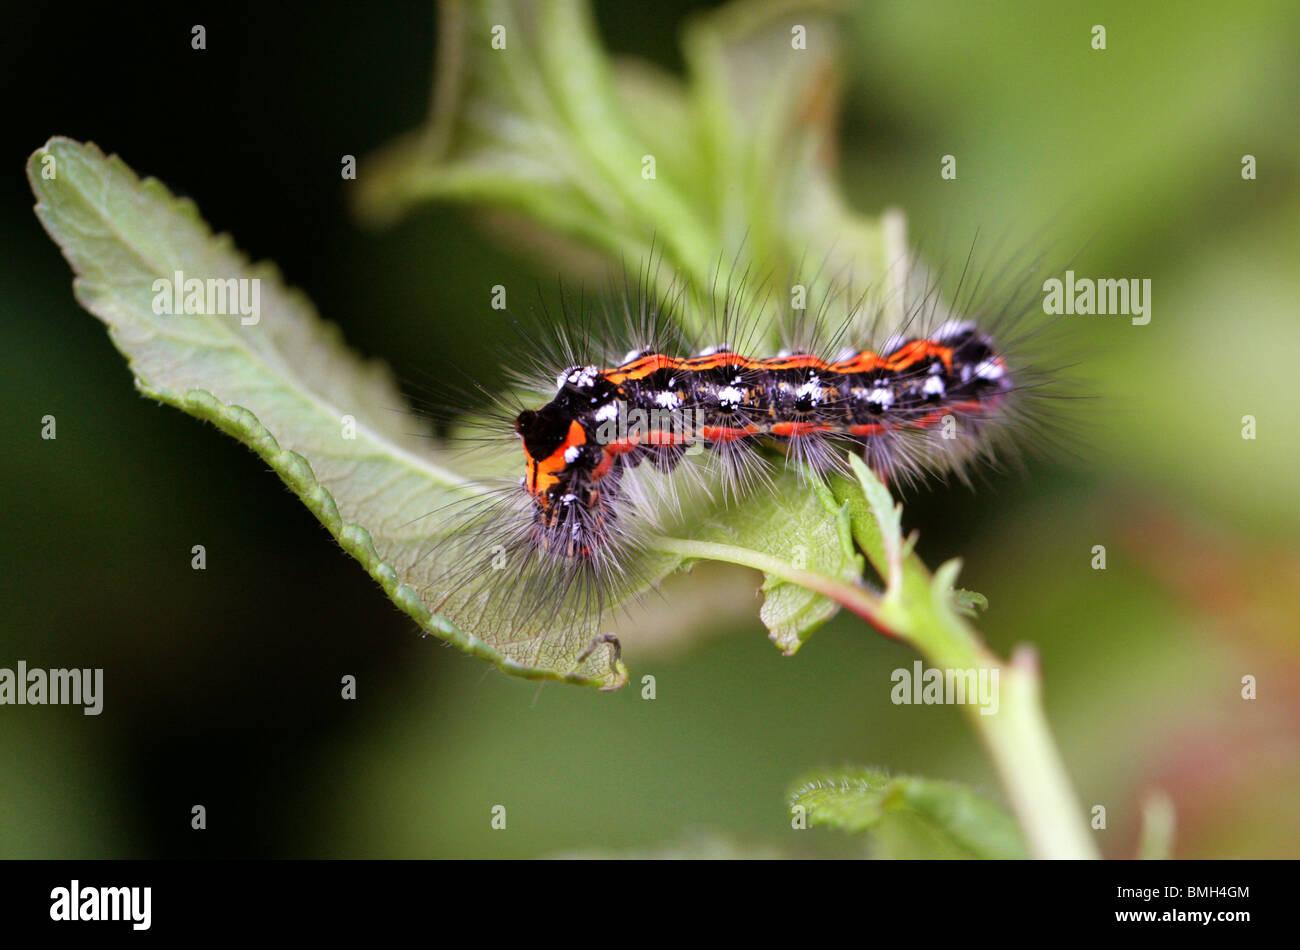 Dague sombre, Acronicta tridens, Caterpillar (Eurosport), Acronictinae, Noctuidae, lépidoptères. Photo Stock